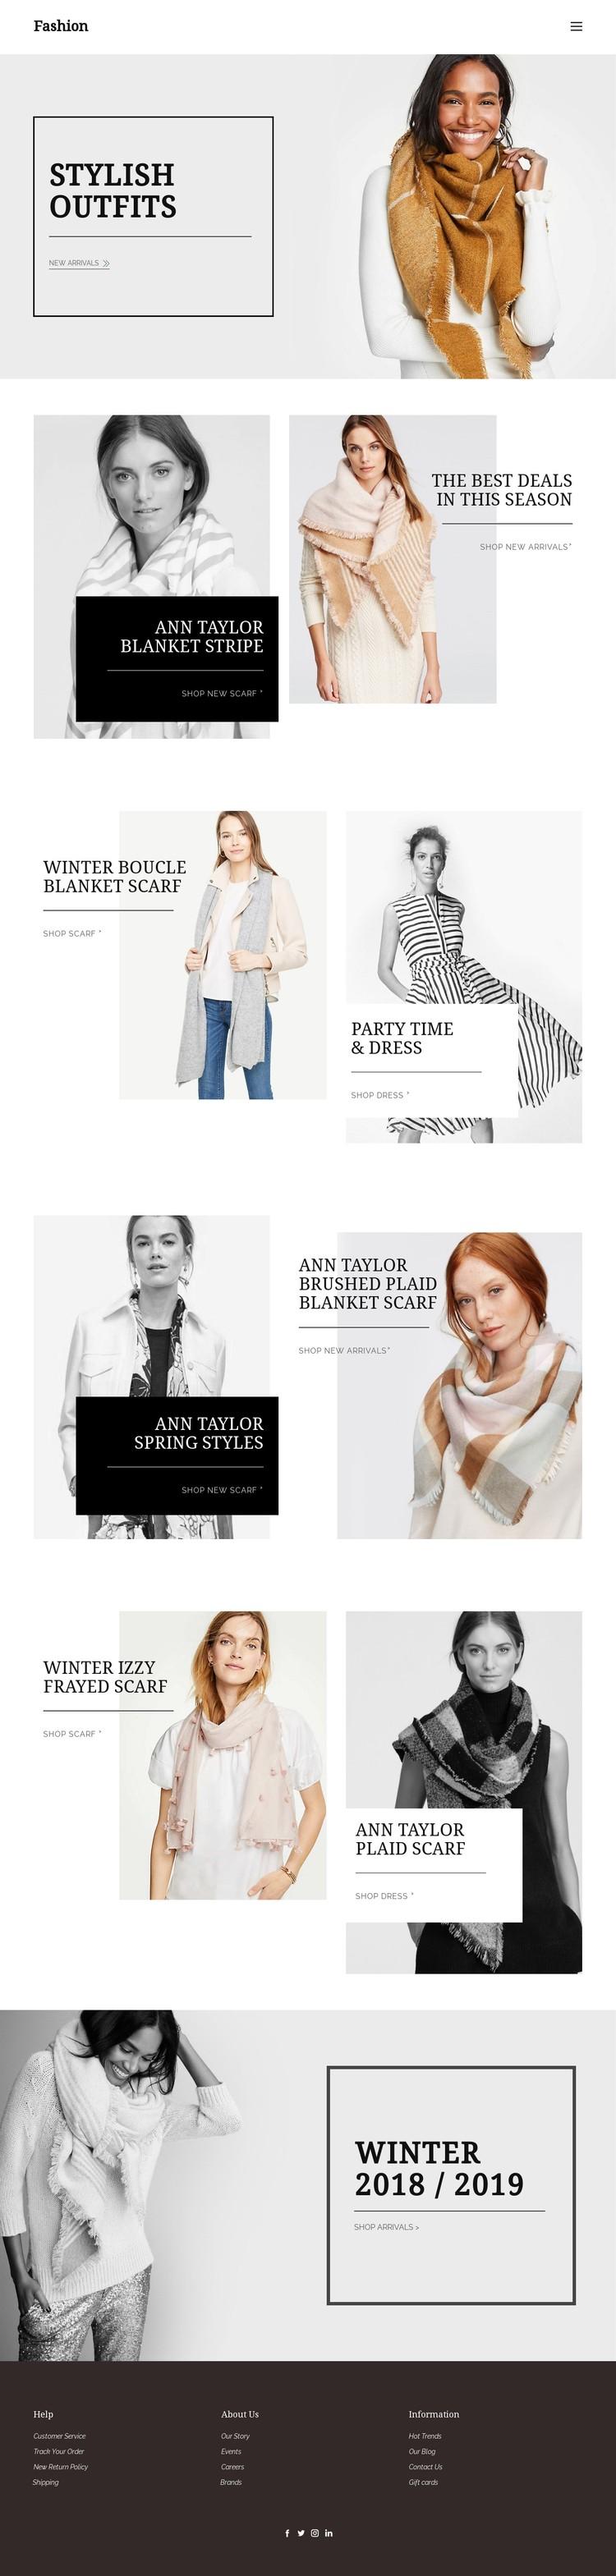 Personal shopper service CSS Template